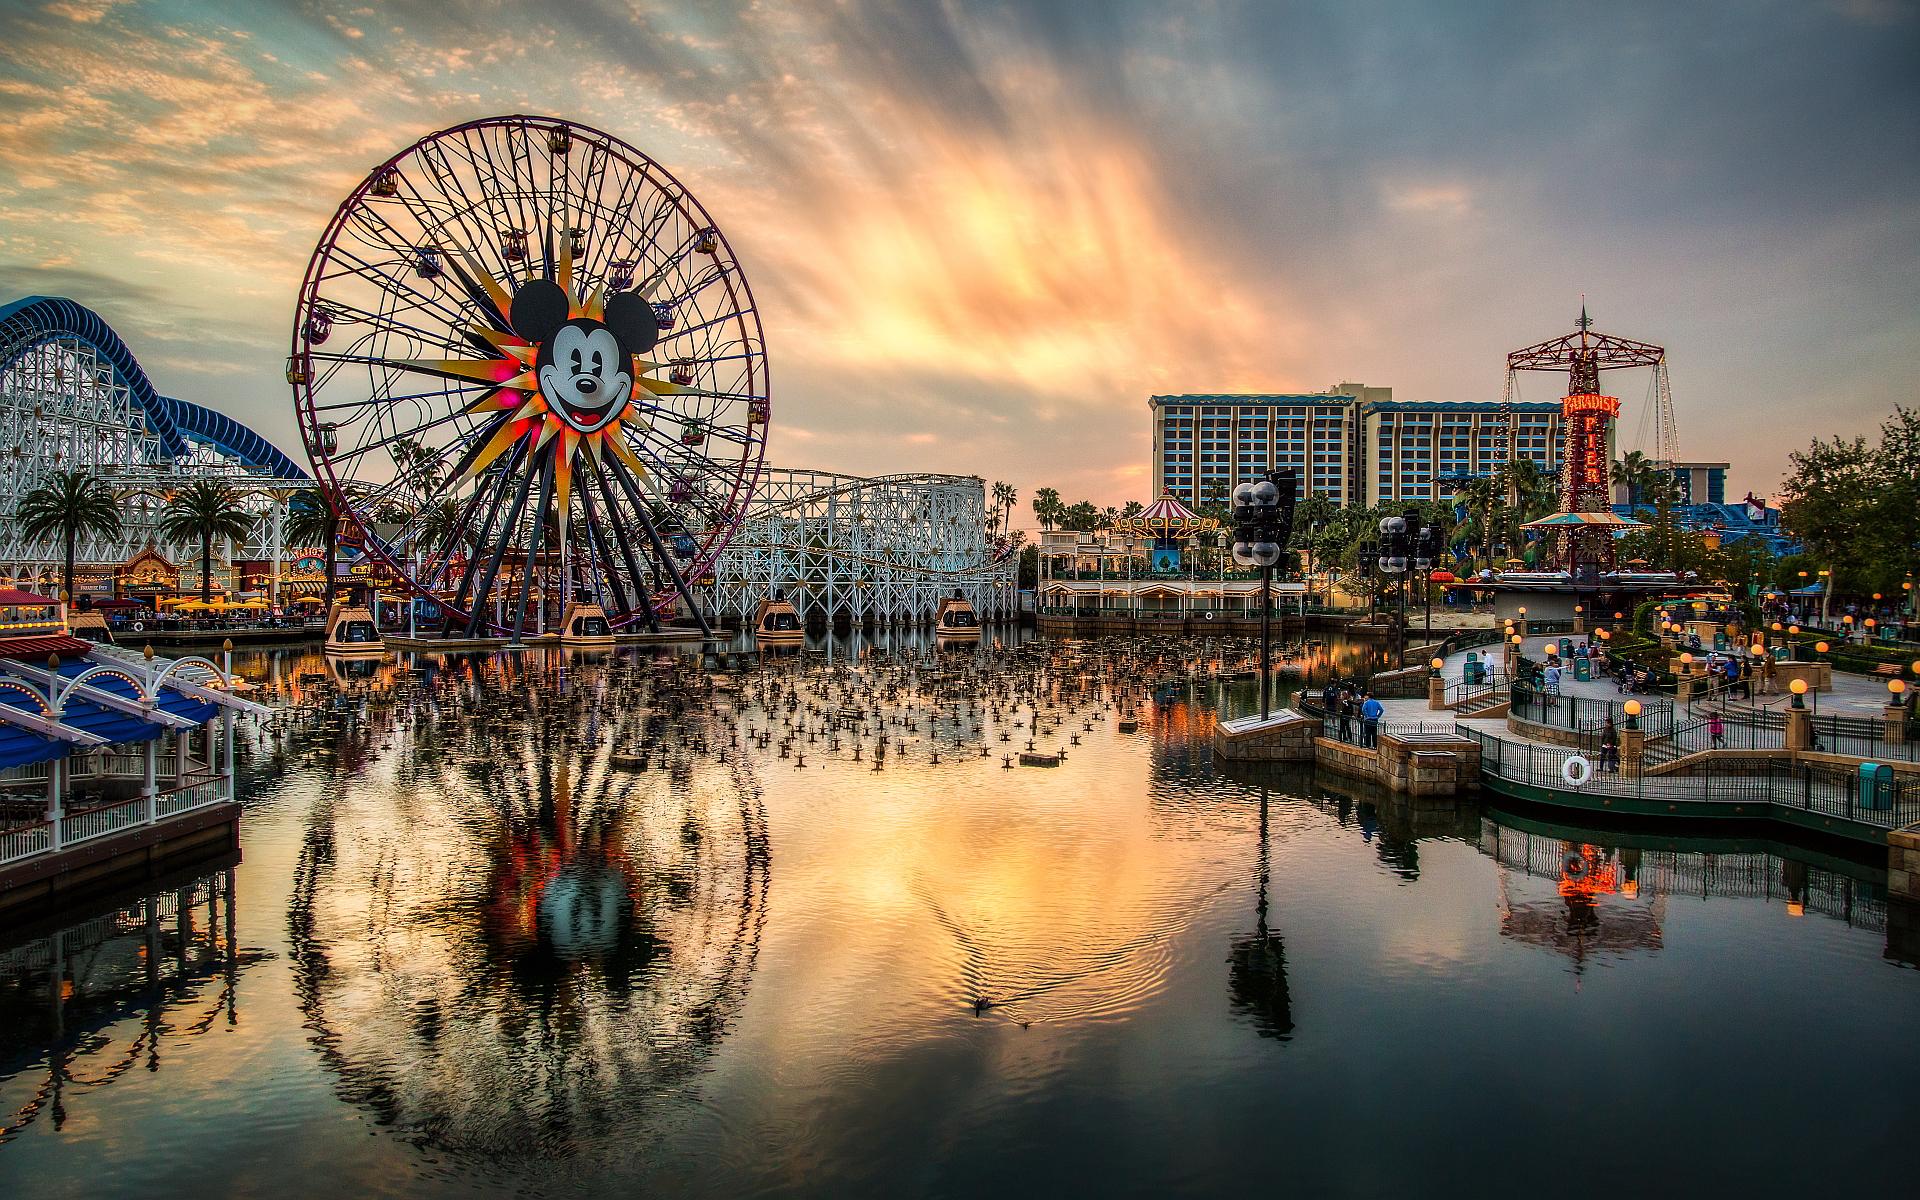 Paradise Pier Desktop Wallpaper | DisneyExaminer